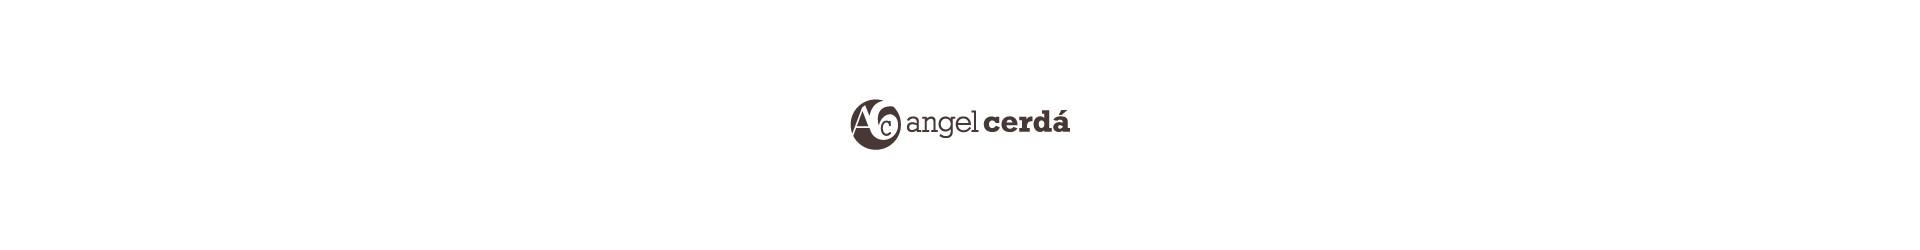 Ángel Cerdá